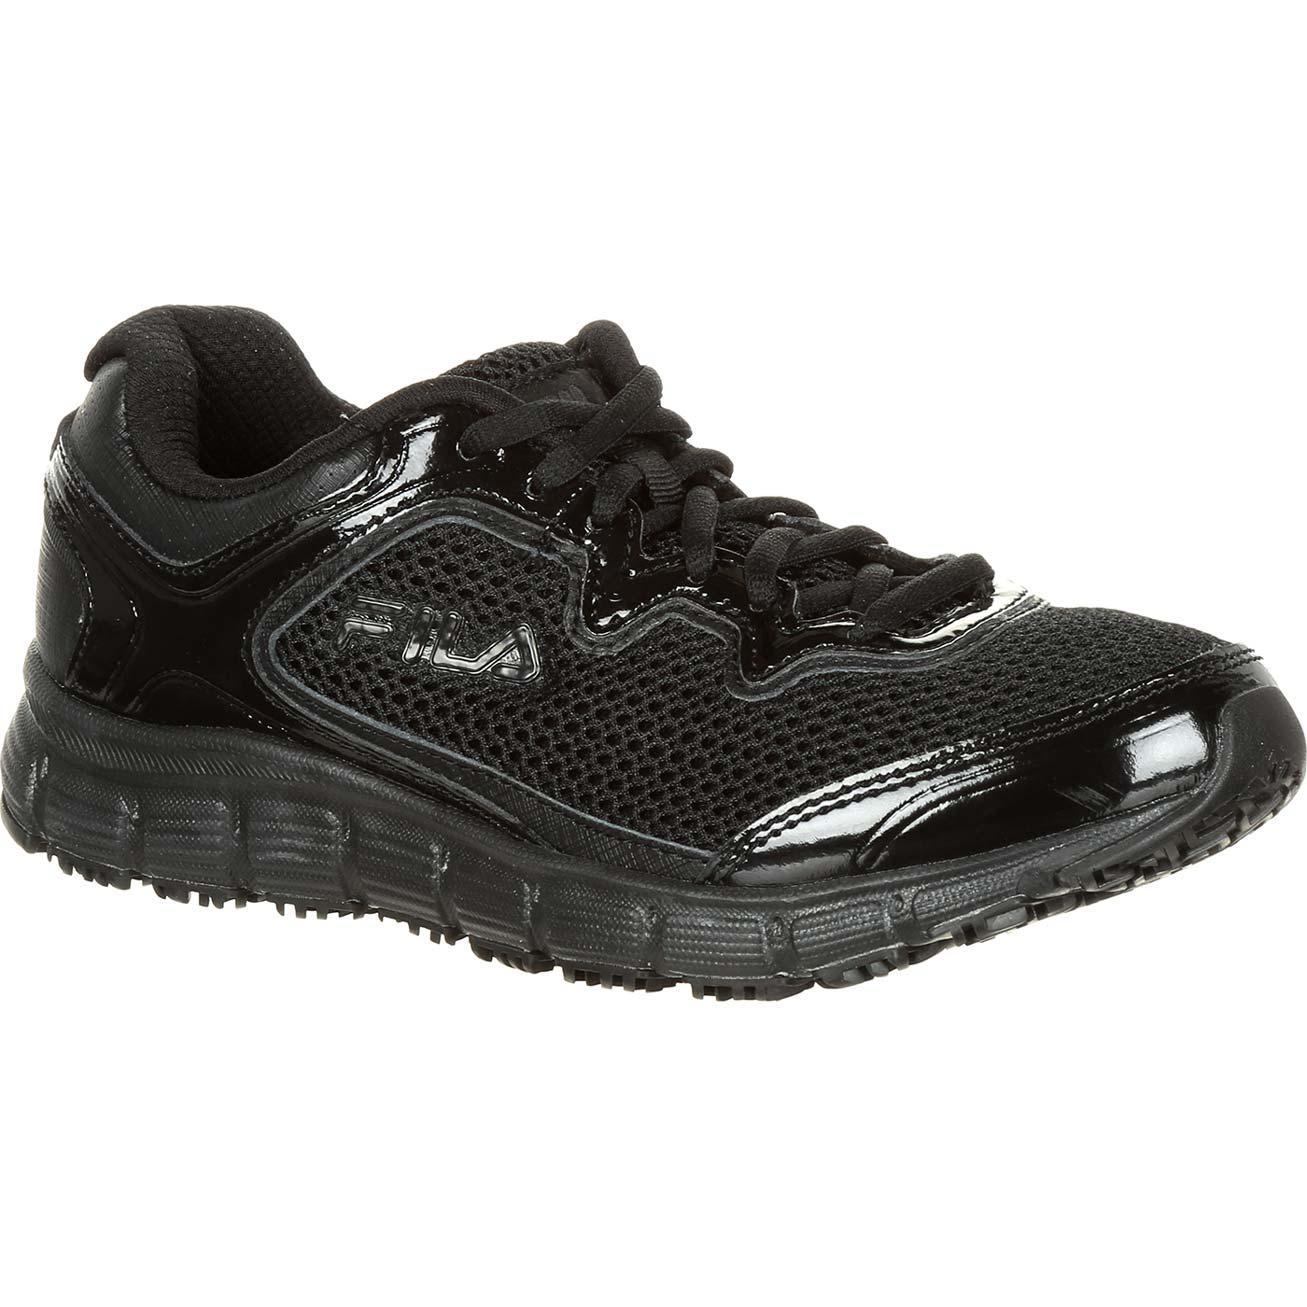 5425f80765b3 Fila Memory Fresh Start Women s Slip-Resistant Work Athletic ShoeFila Memory  Fresh Start Women s Slip-Resistant Work Athletic Shoe